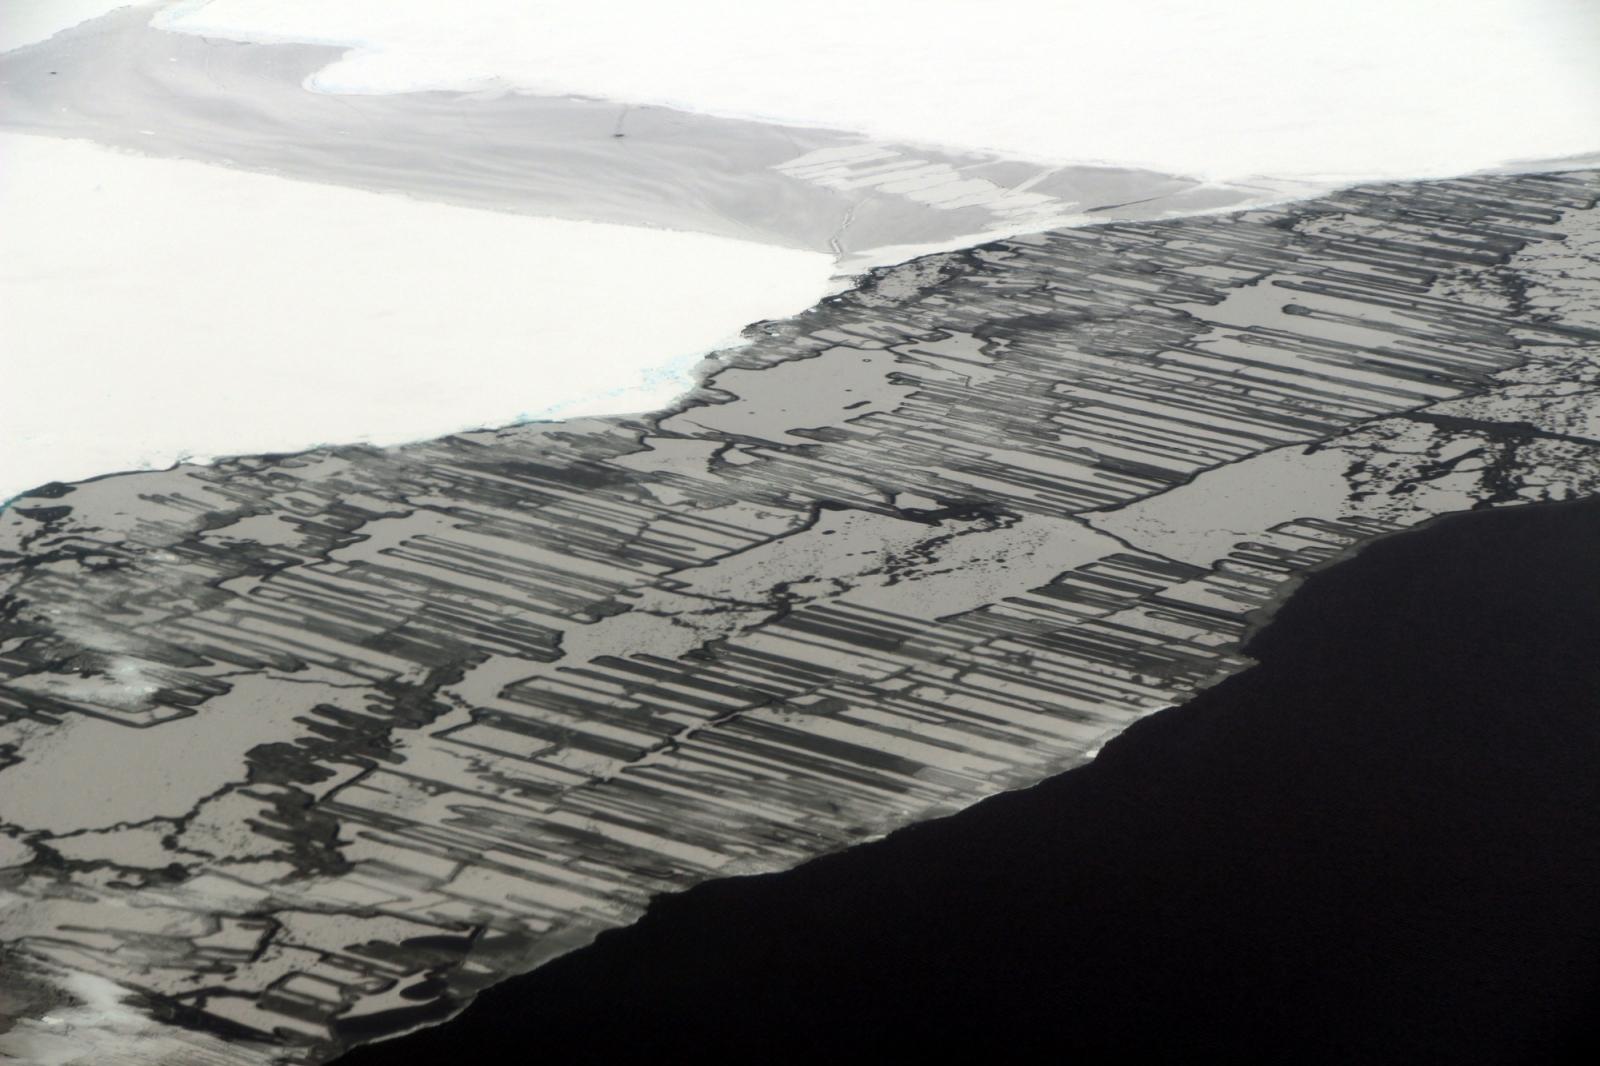 NASA IceBridge